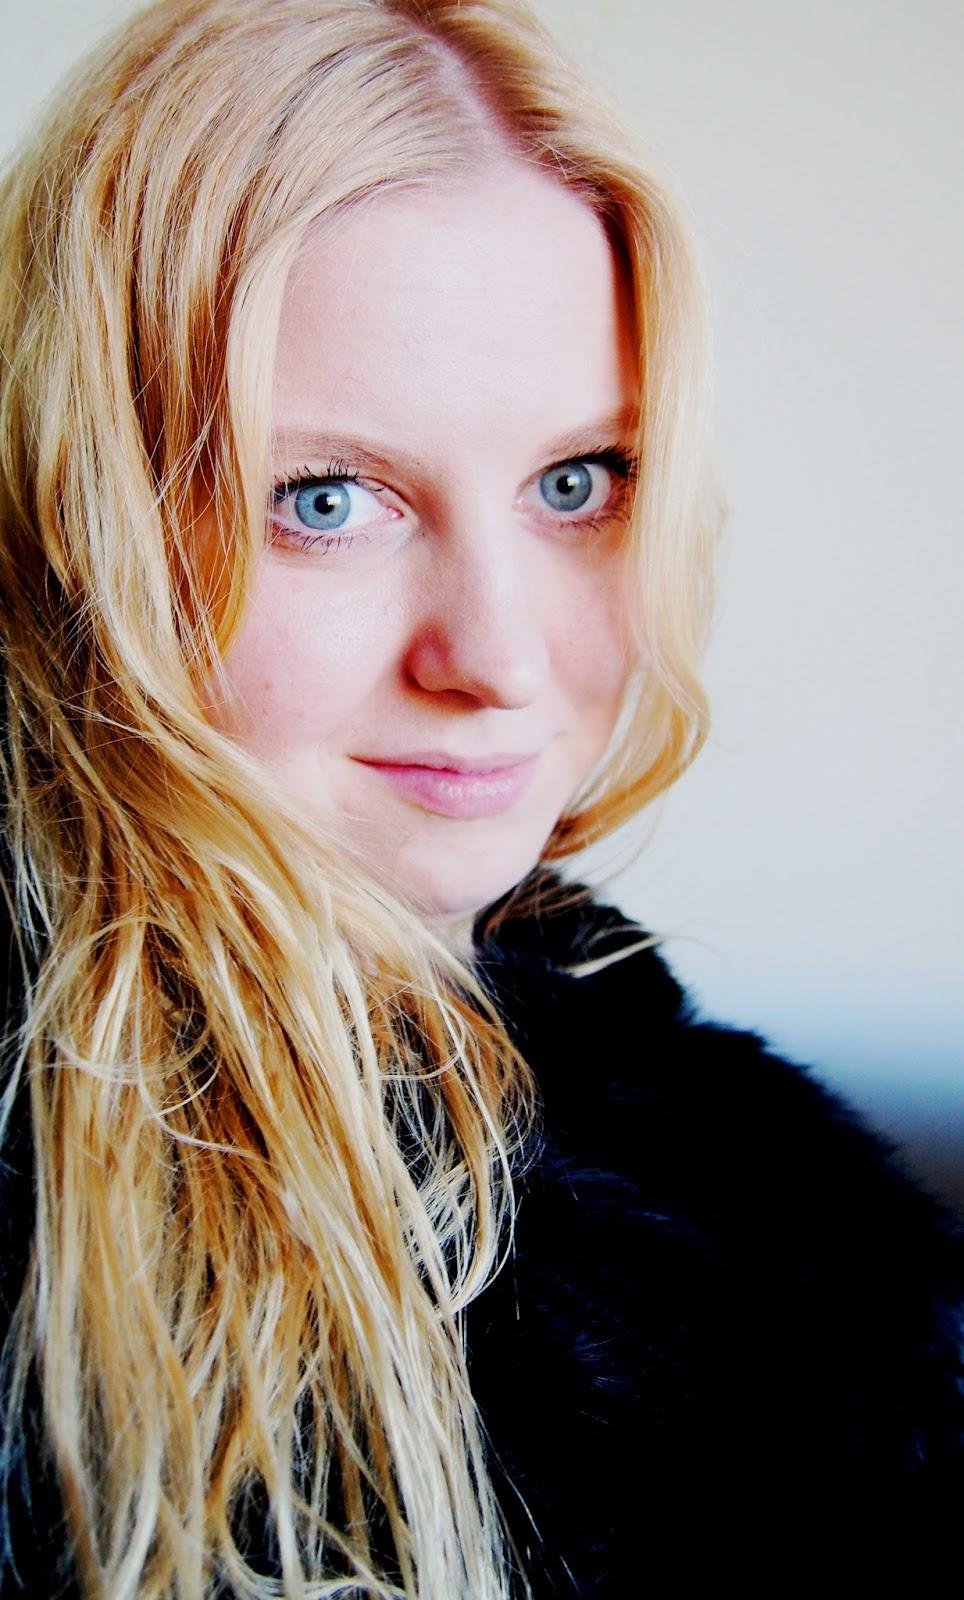 #beauty #hair #blonde #furr #poncho #blue #eyes #flawles #skin #face #makeup #nude #beautiful #kaunis #nainen #girl #happy #onnellinen